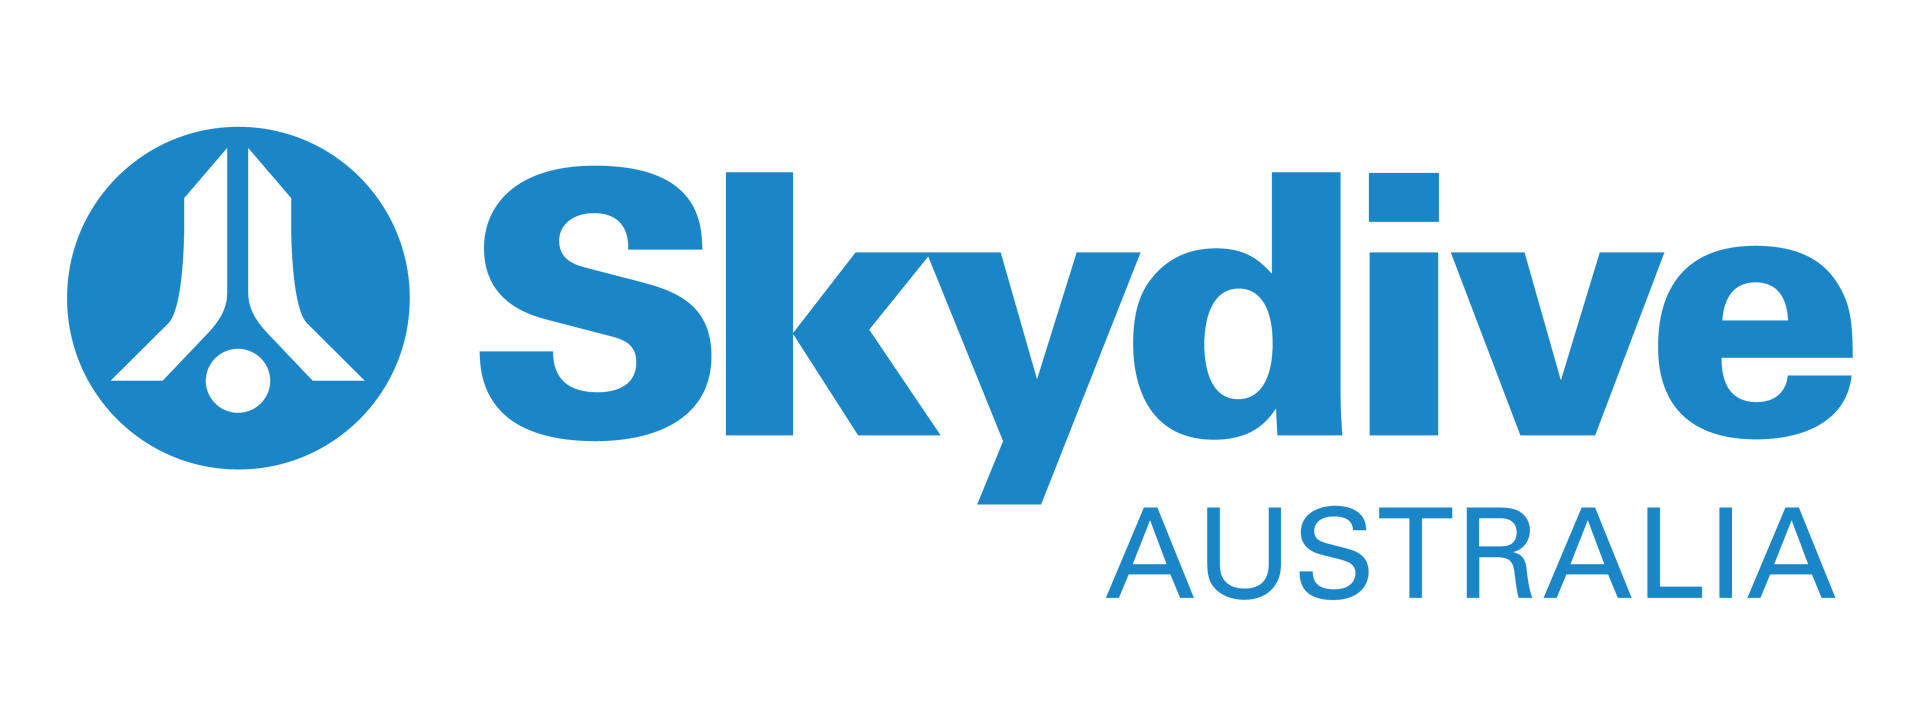 SKYDIVE-AUSTRALIA-HORIZONTAL_Blue.png